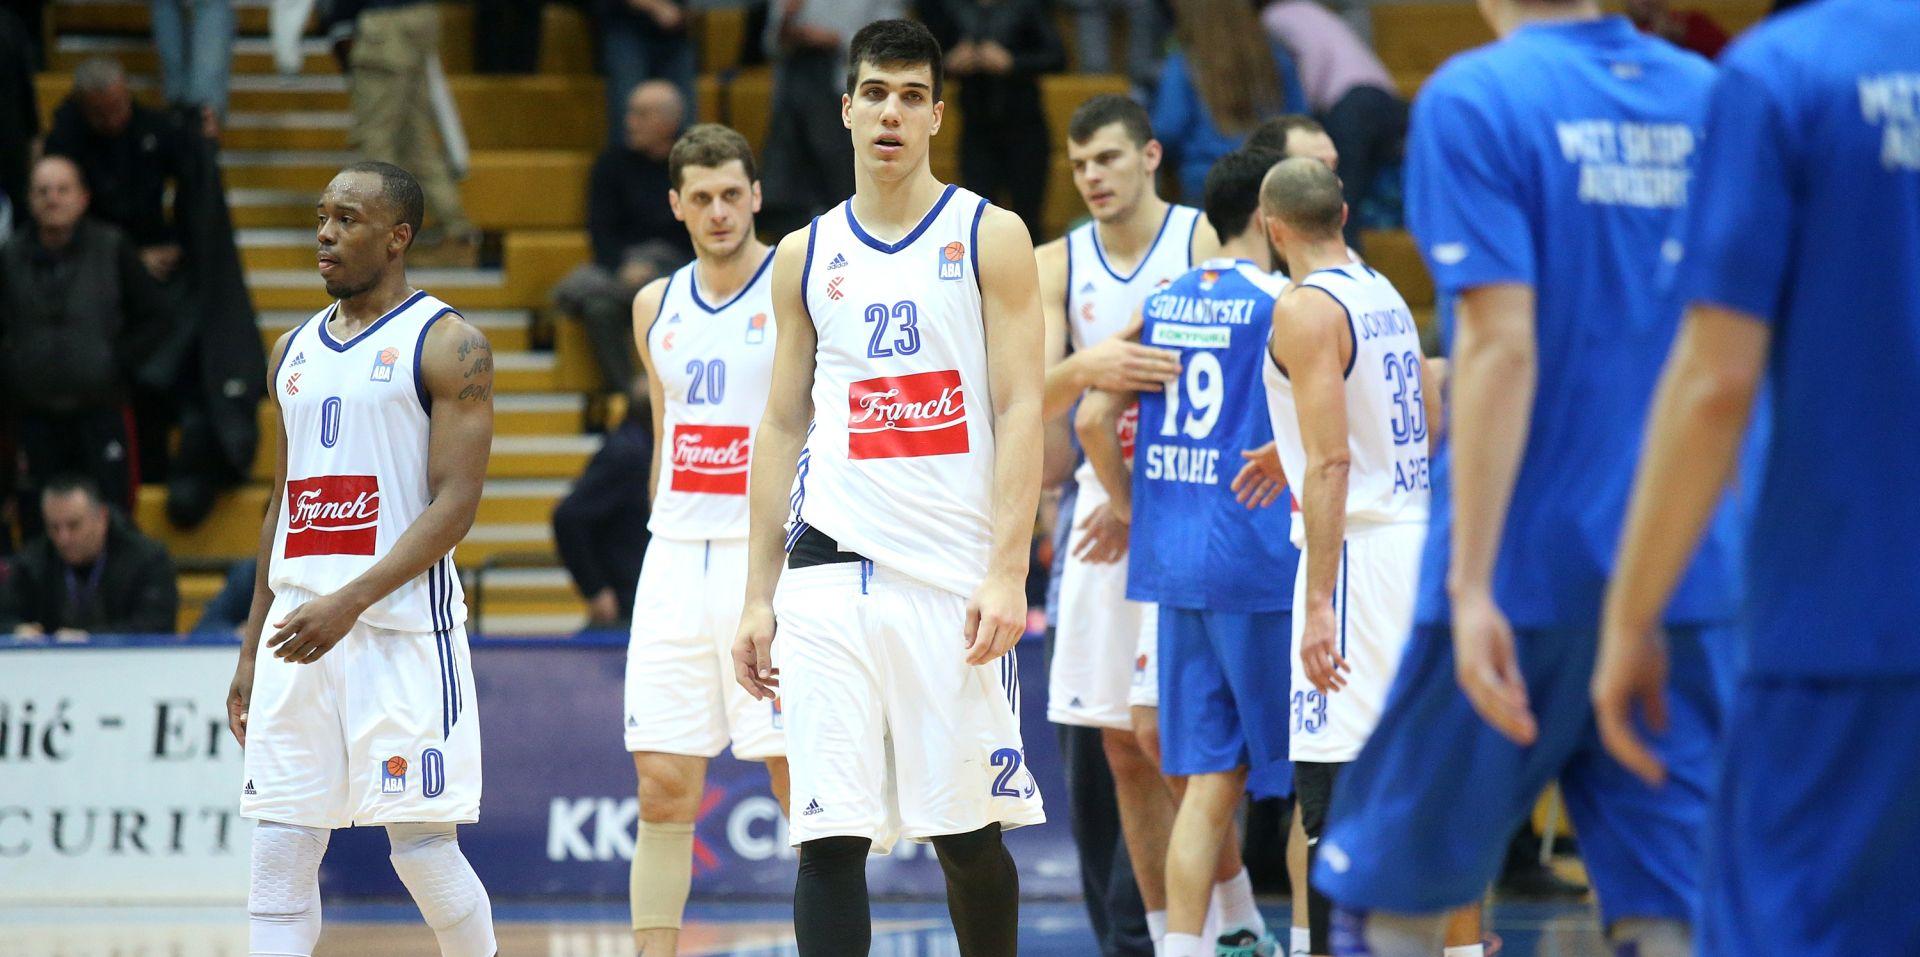 ABA LIGA Cibona protiv Igokee upisala 12. poraz sezone